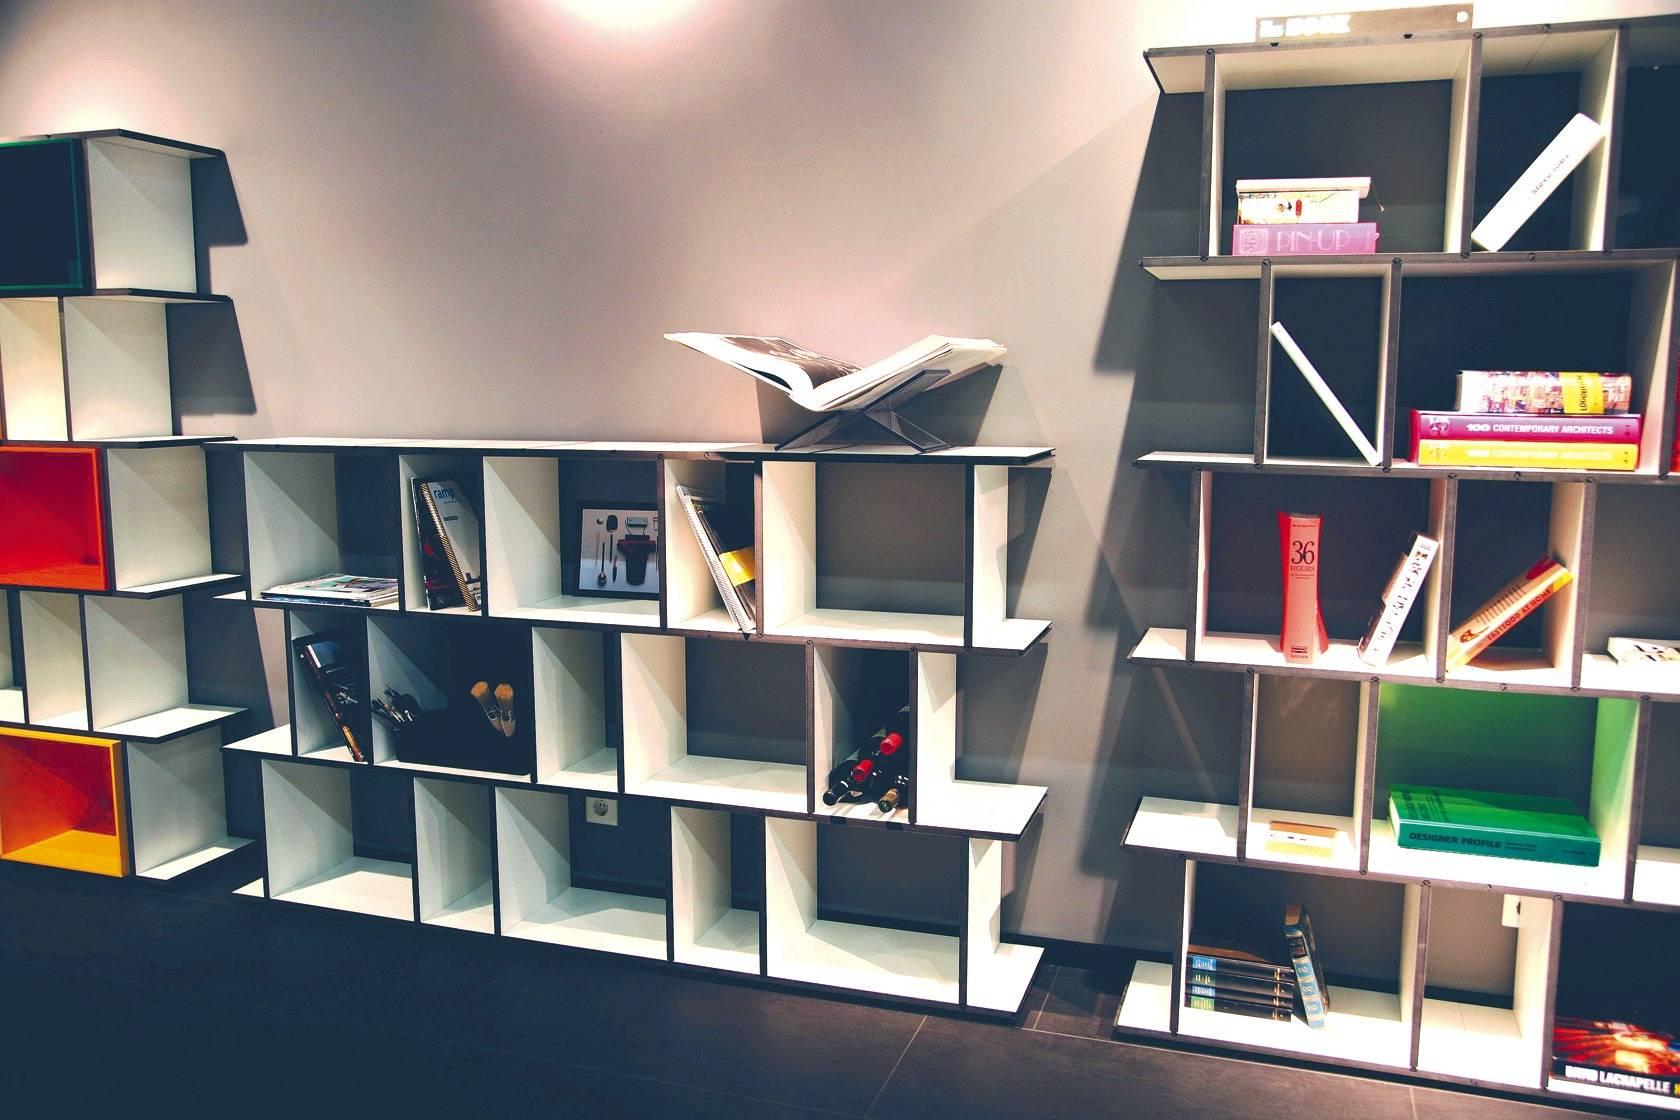 regale aus flexiblen modulen wie baukl tzchen f r. Black Bedroom Furniture Sets. Home Design Ideas